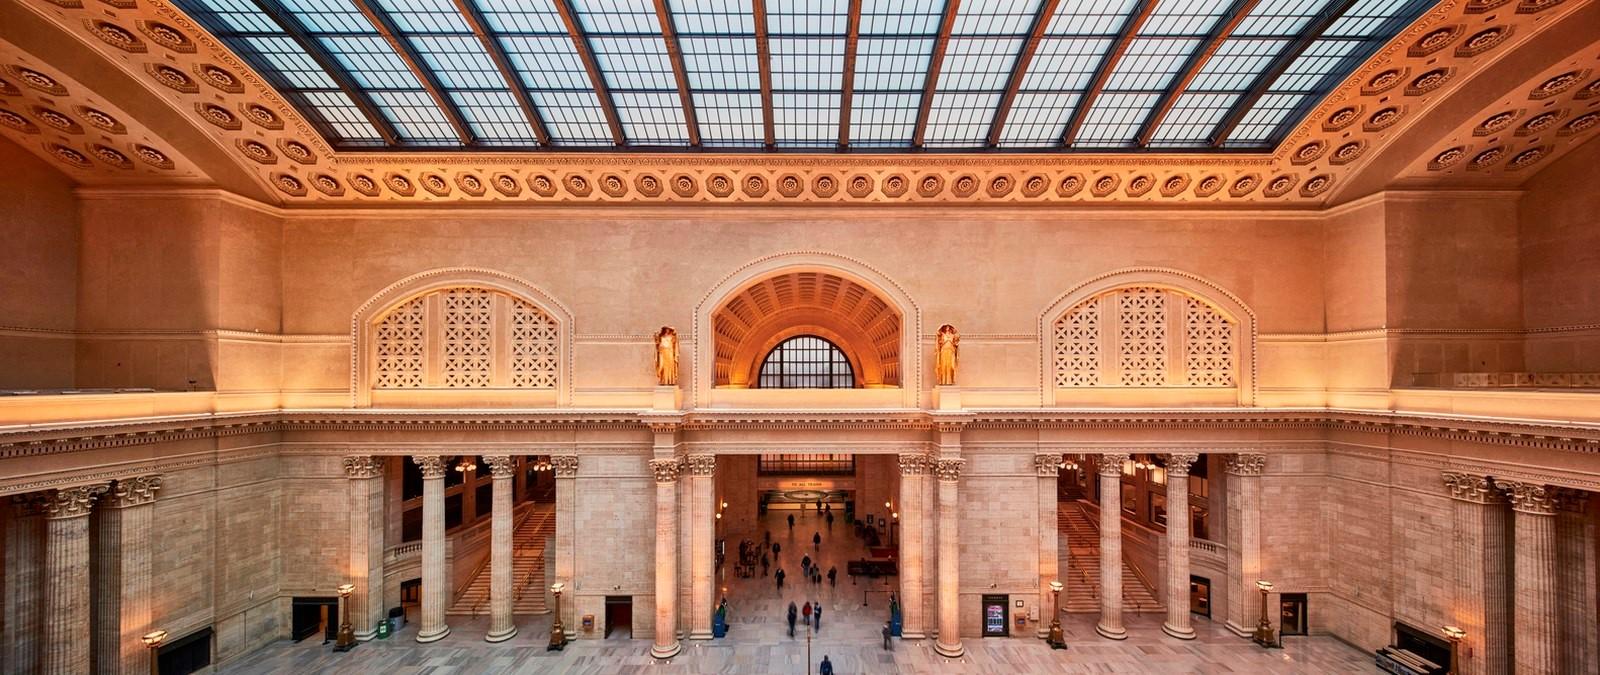 Chicago Union Station, Chicago [1925] - Sheet1